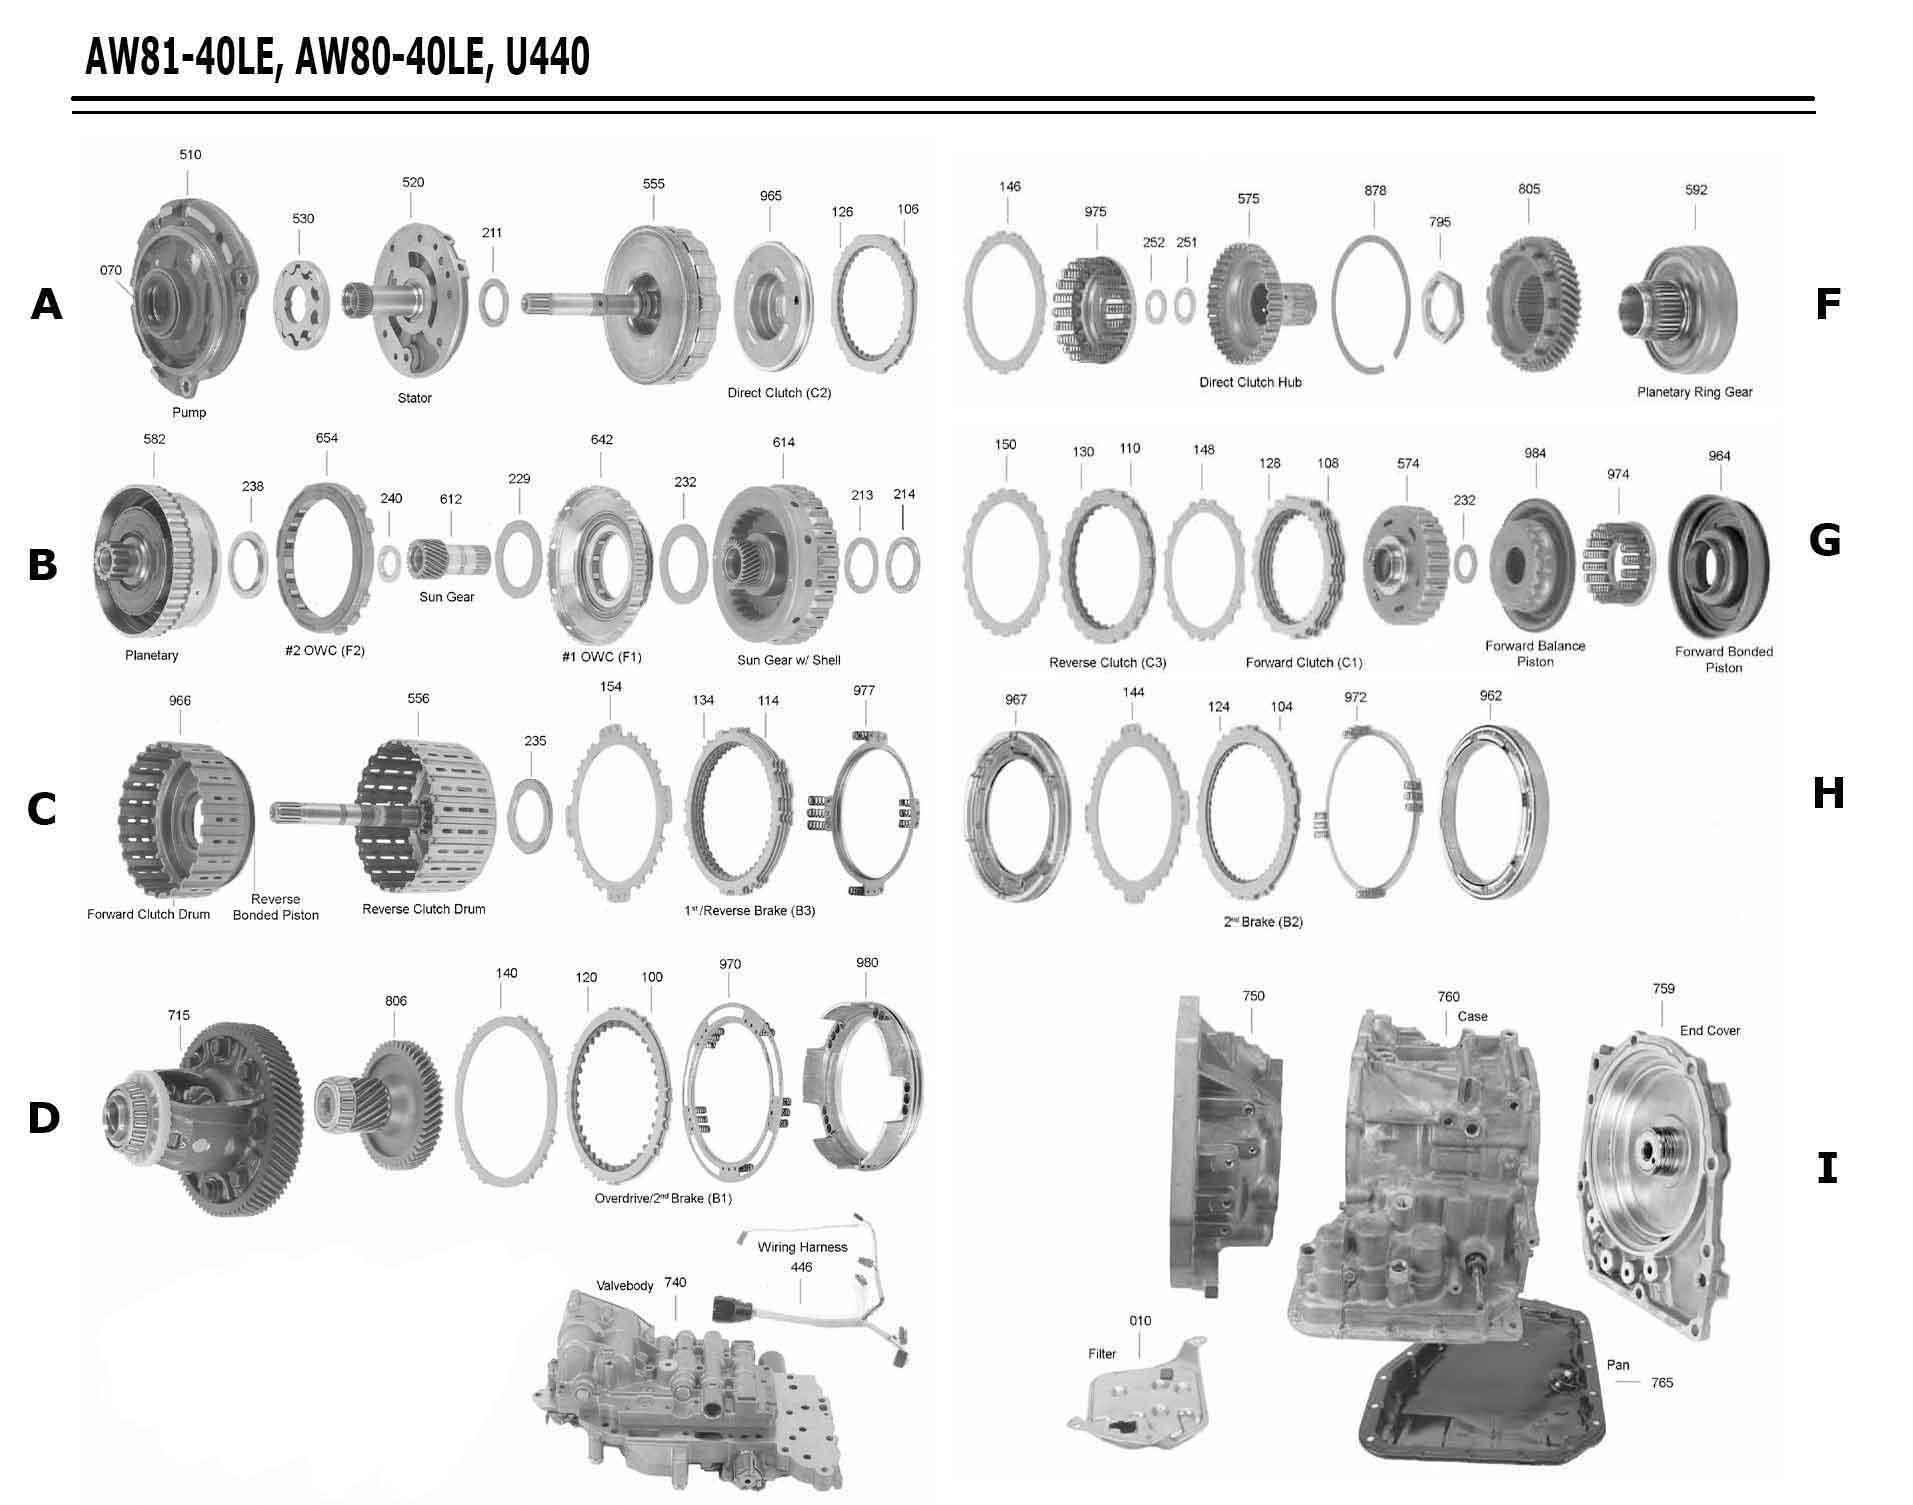 Transmission Repair Manuals U440e   Aw80  81